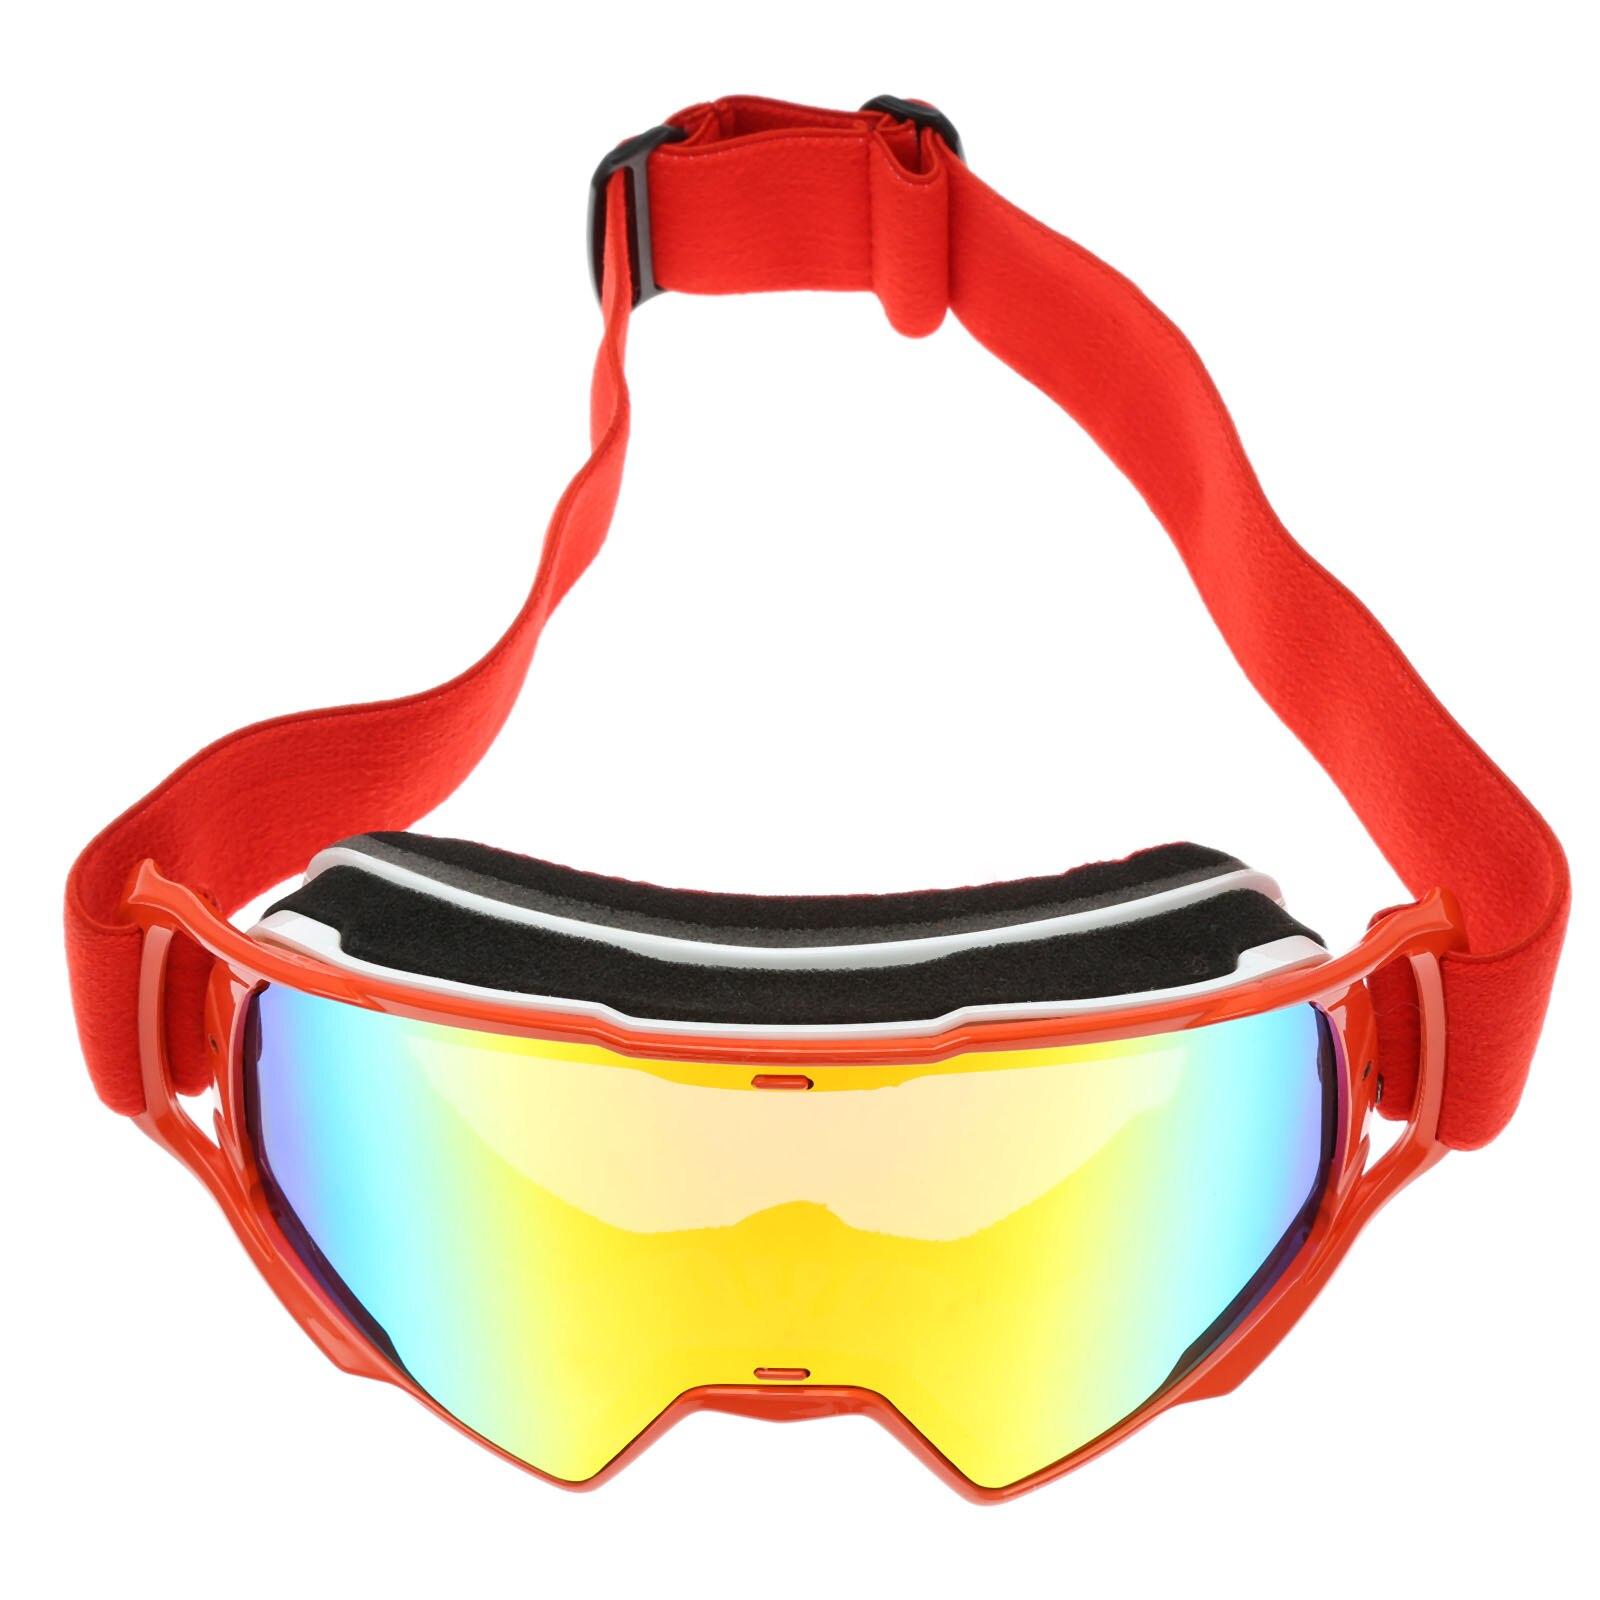 New Anti-UV Motorcycle Goggles Glasses Motocross Skiing Googles Country Sunglasses Tinted Snowboard ATV Glasses Off-Road Eyewear